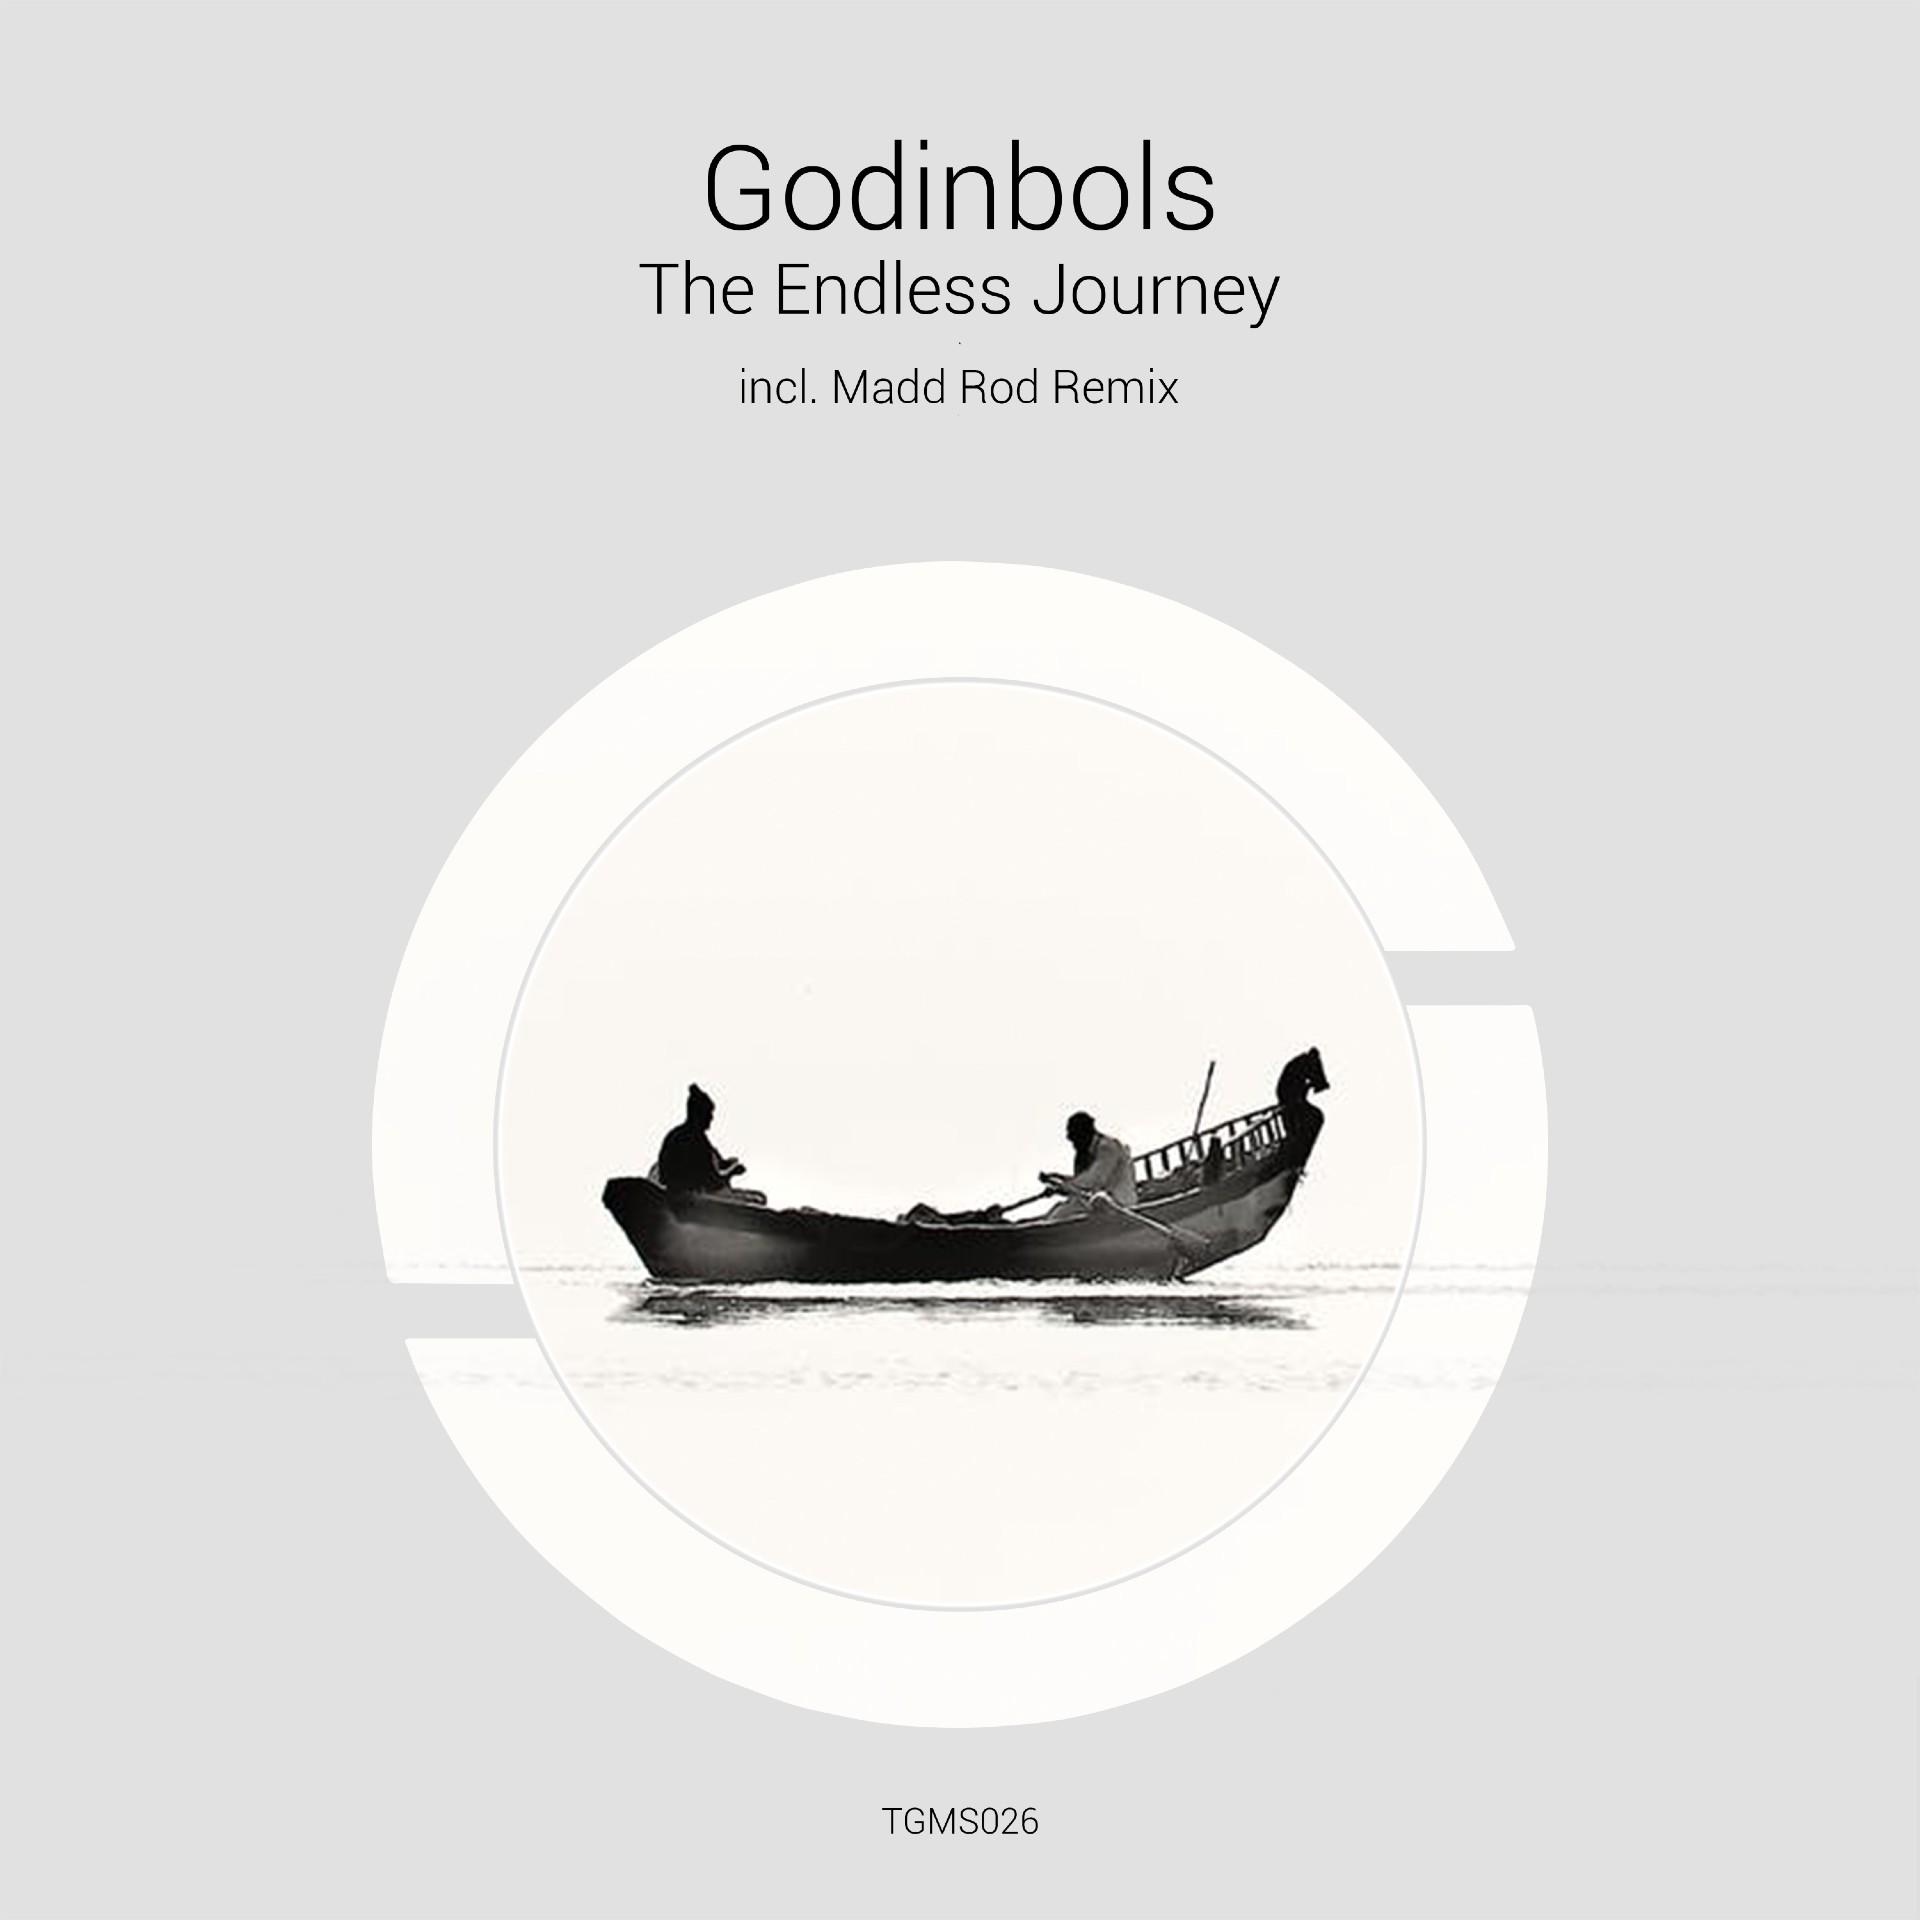 Godinbols - The Endless Journey